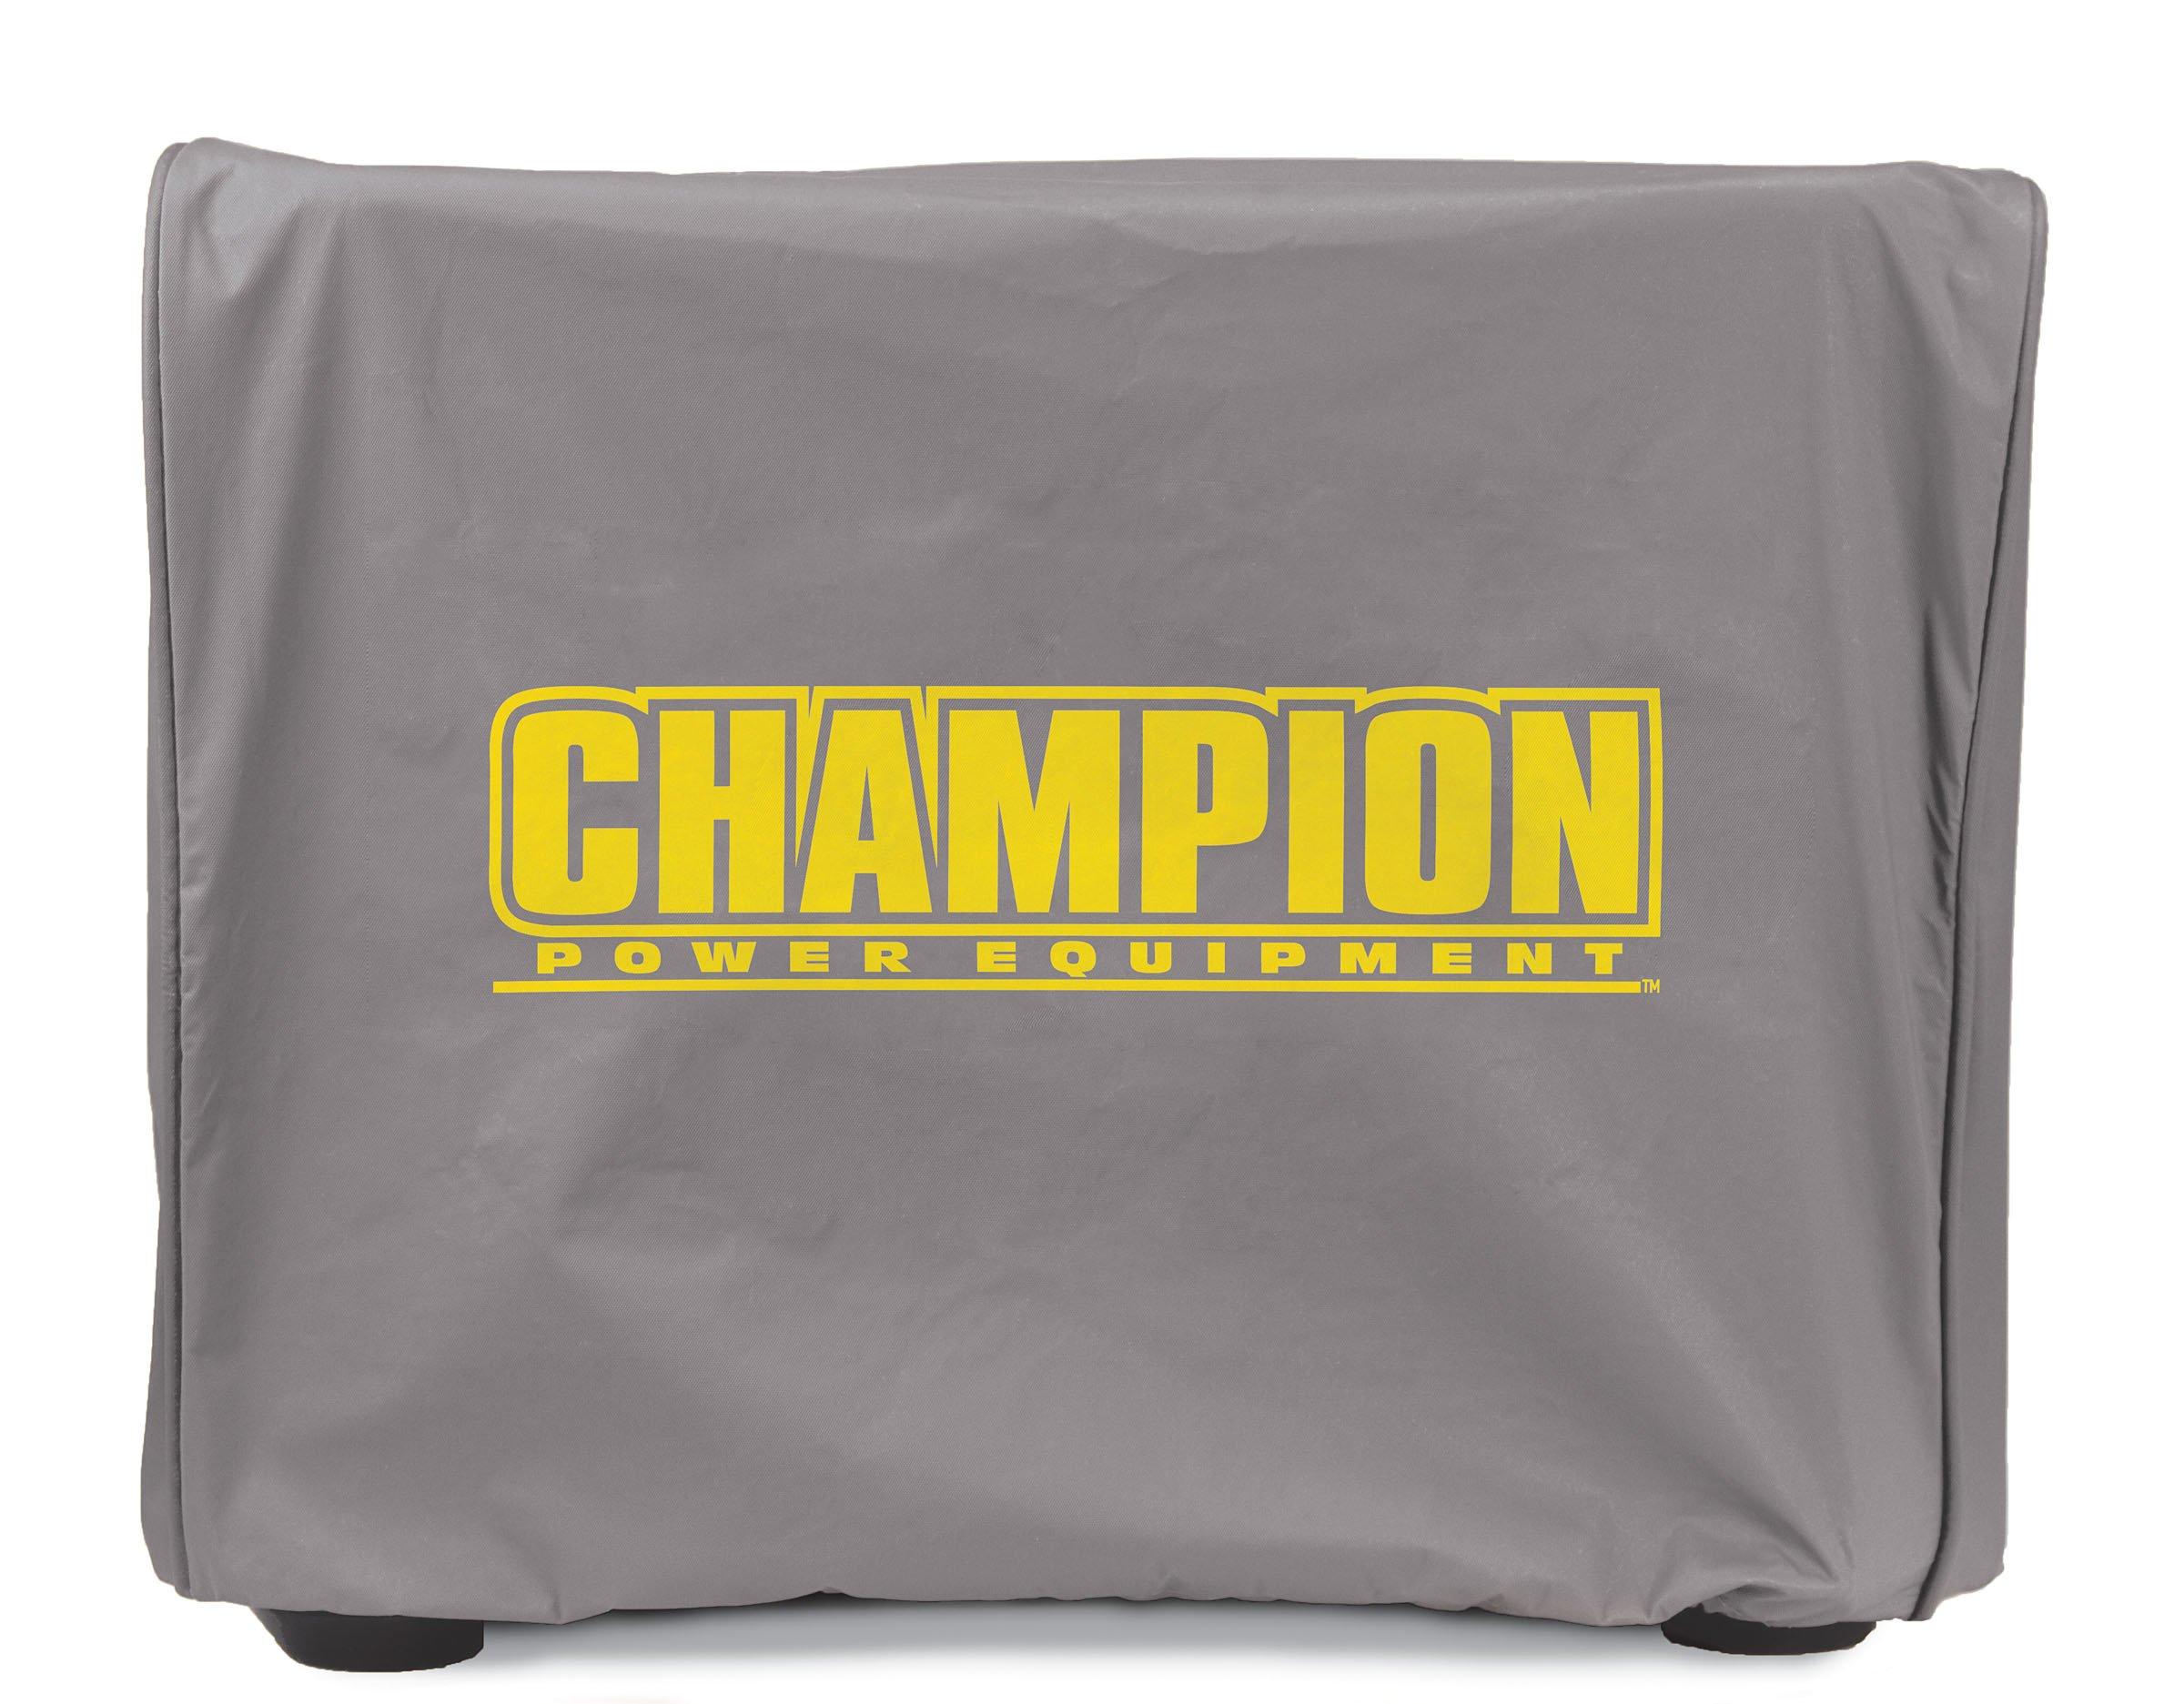 Champion Weather-Resistant Storage Cover for 2000-Watt Inverter Generators by Champion Power Equipment